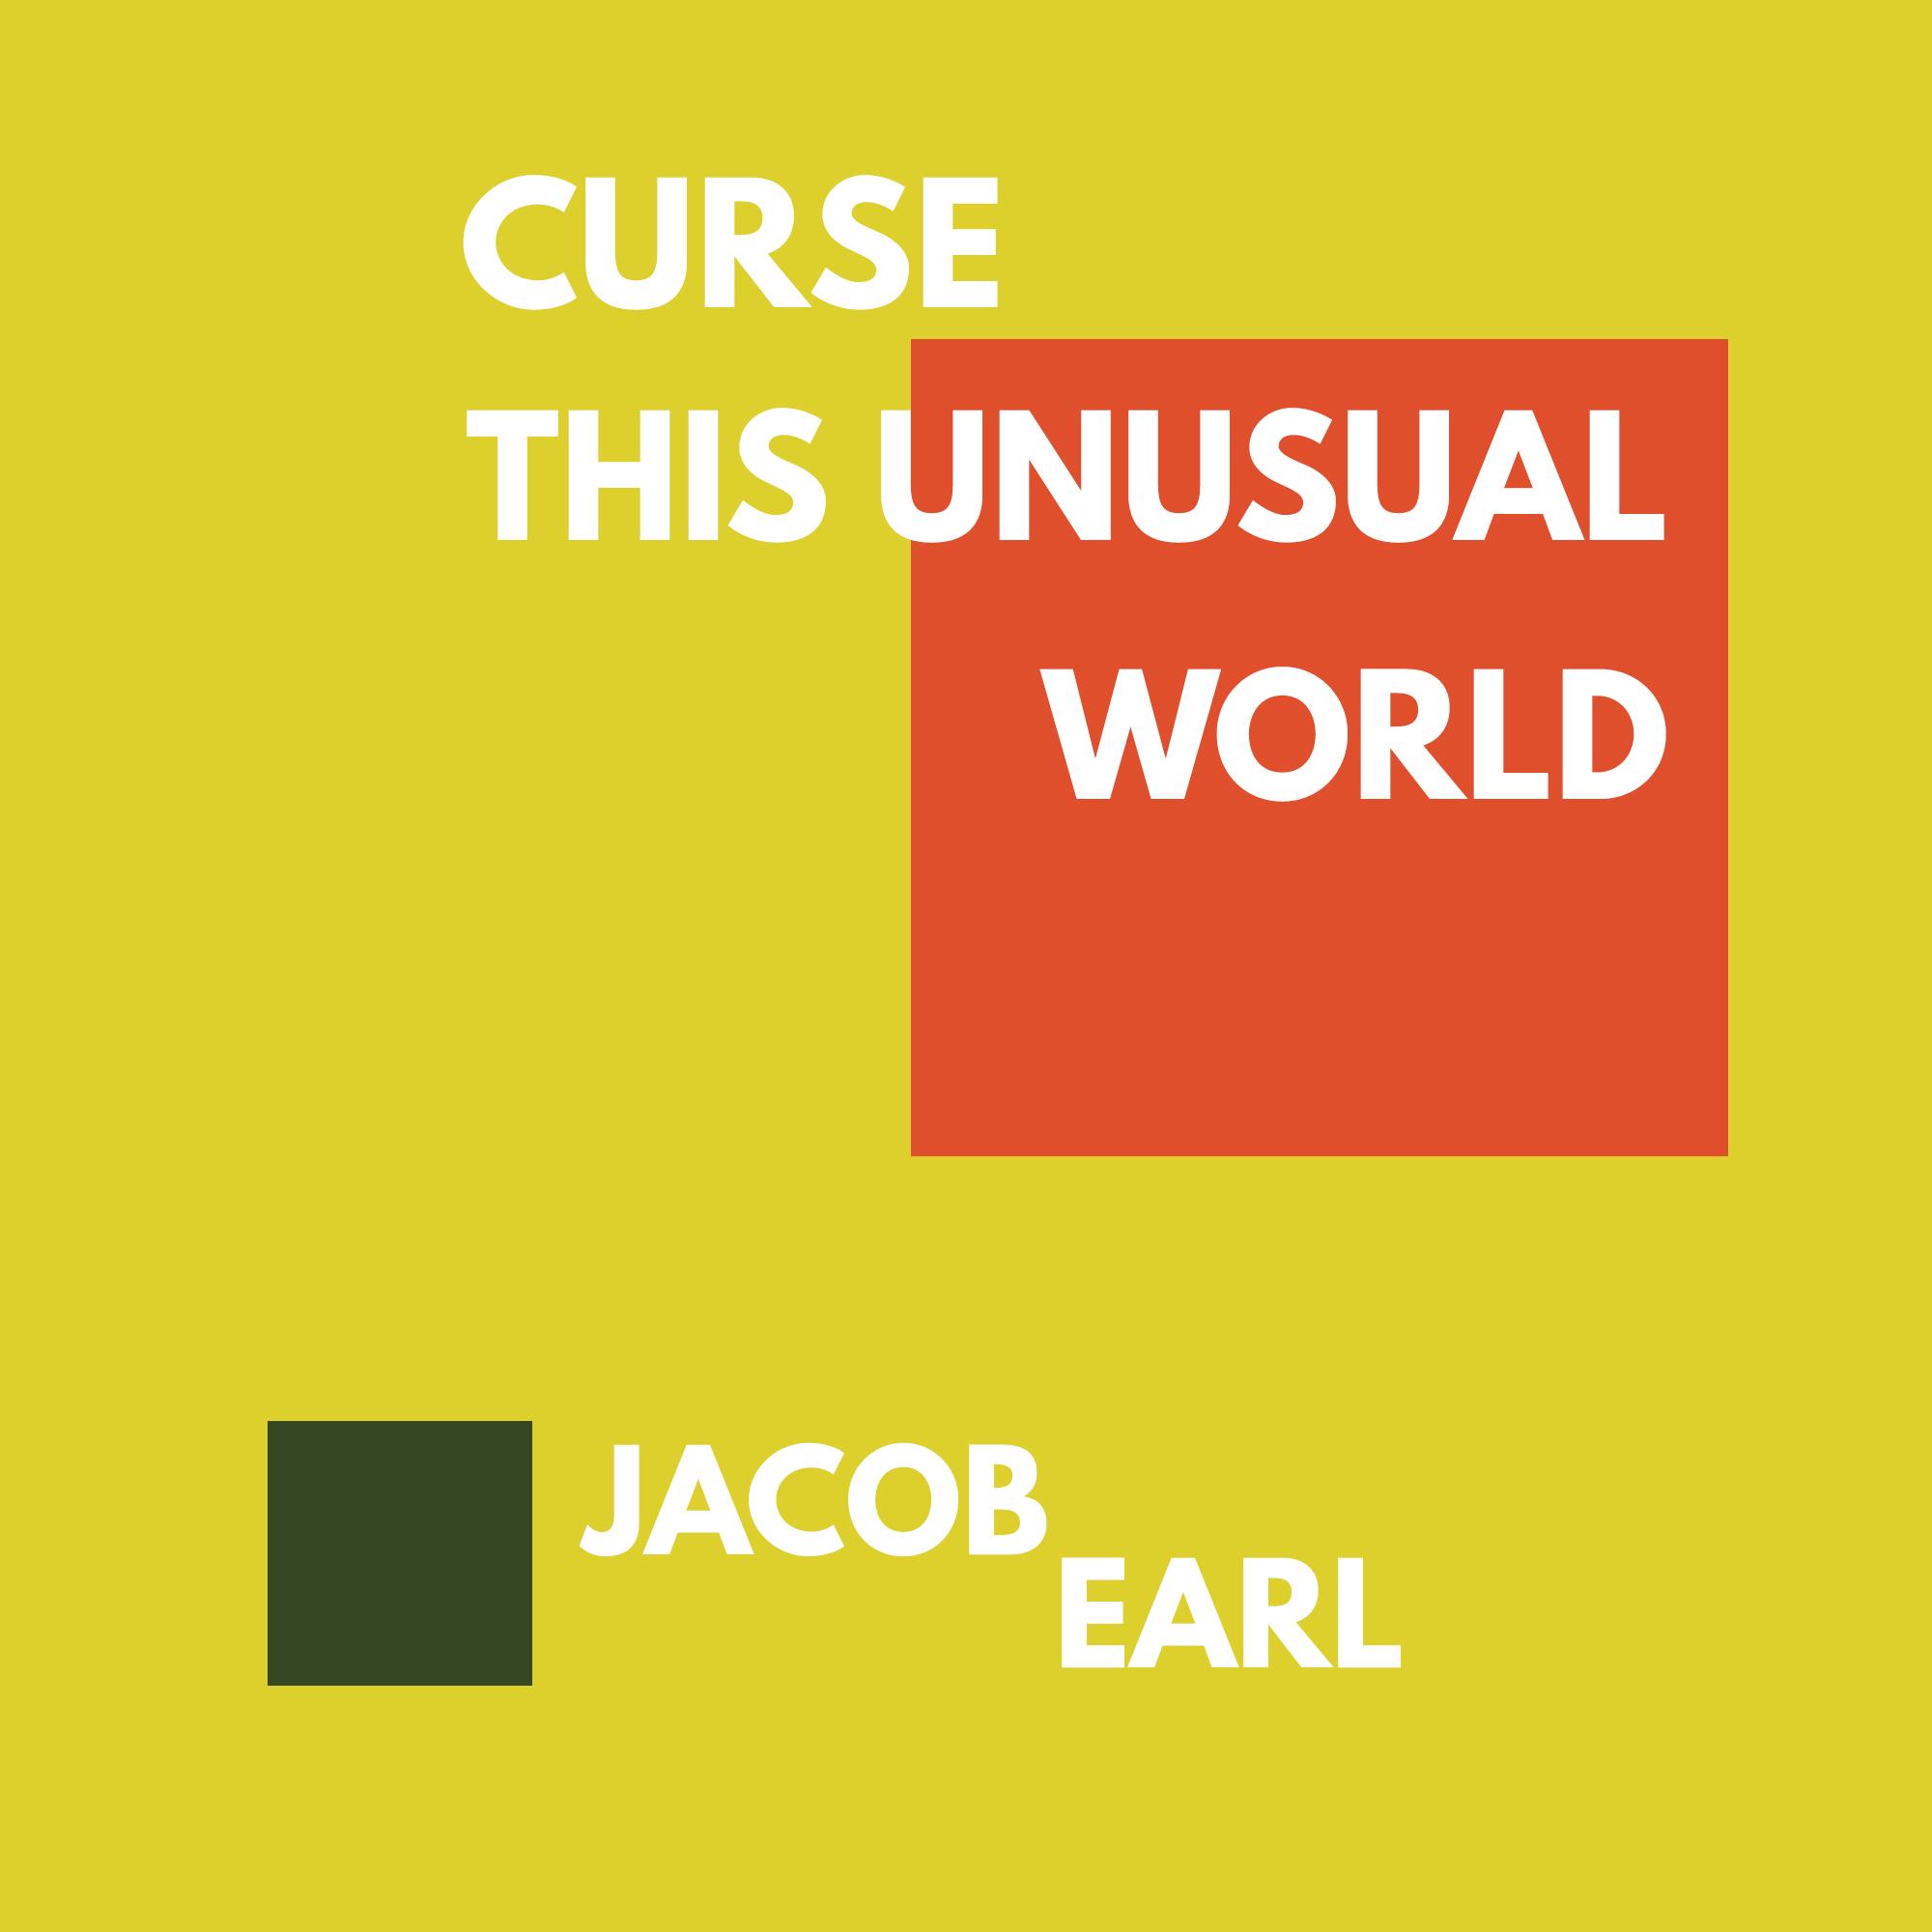 curse this unusual world cover 2.jpg